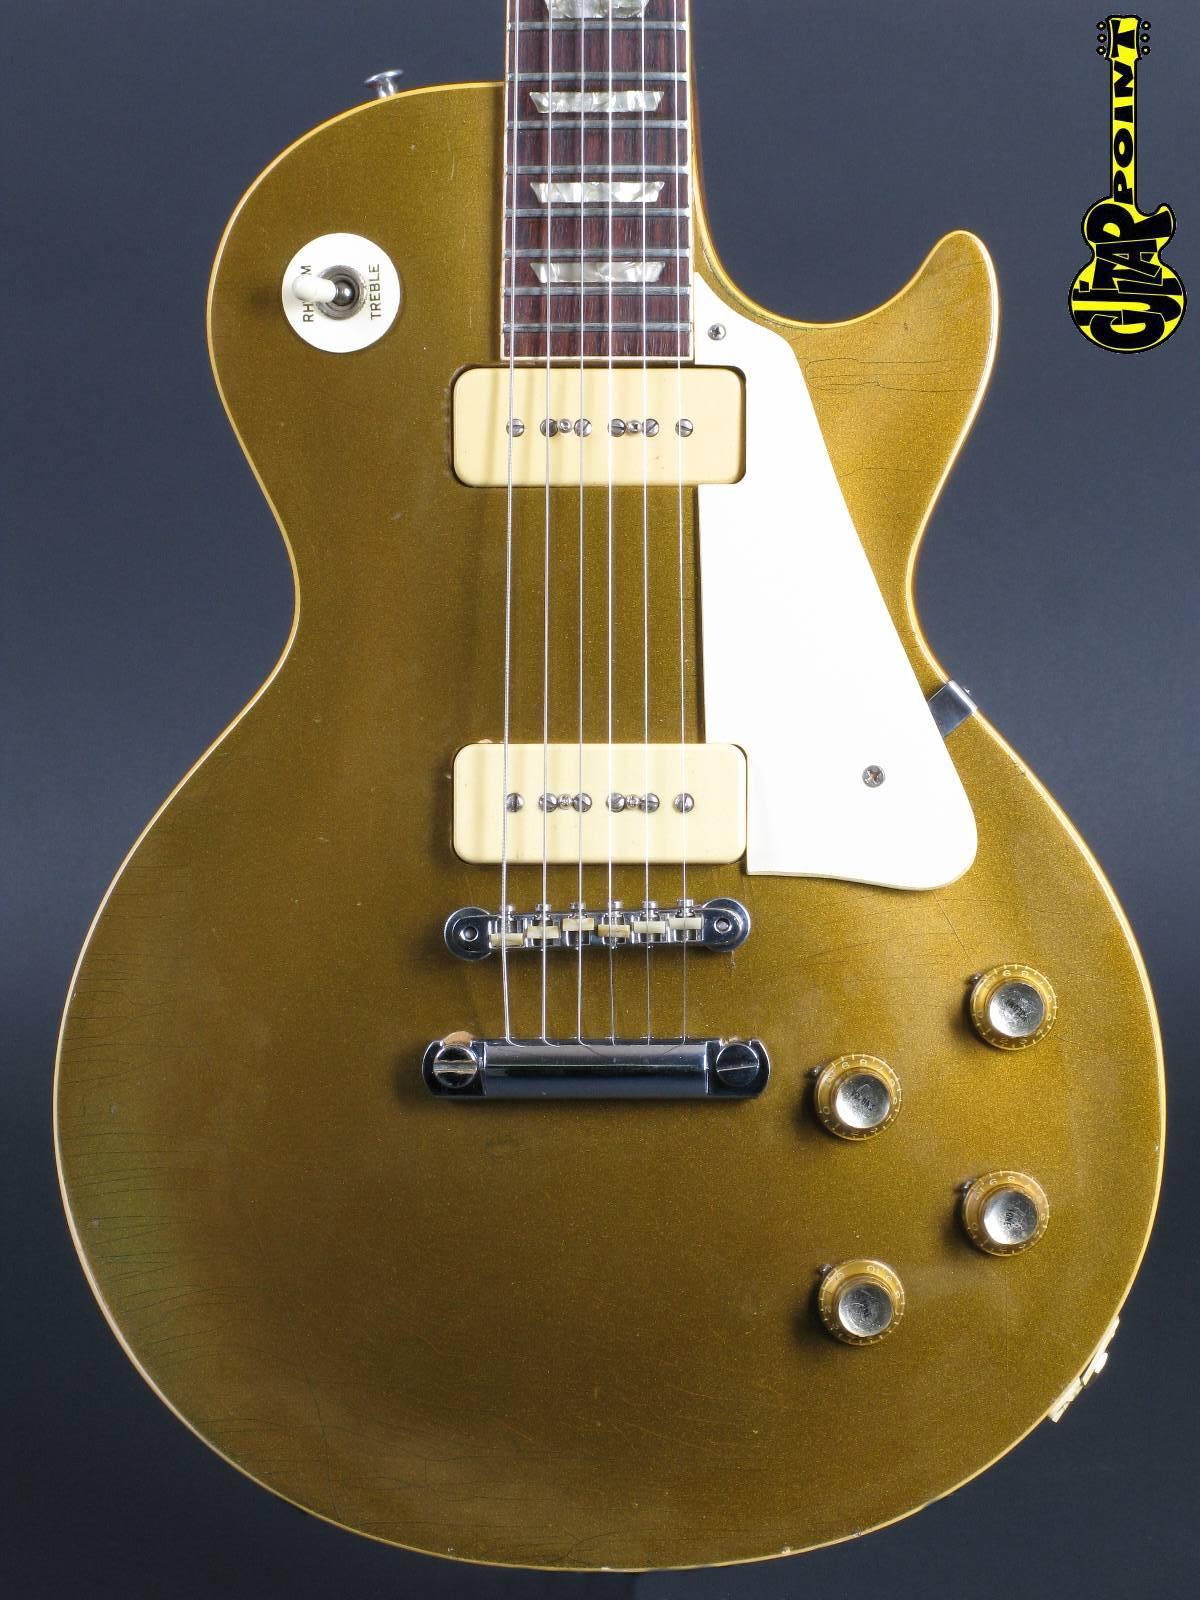 1969 Gibson Les Paul GoldTop